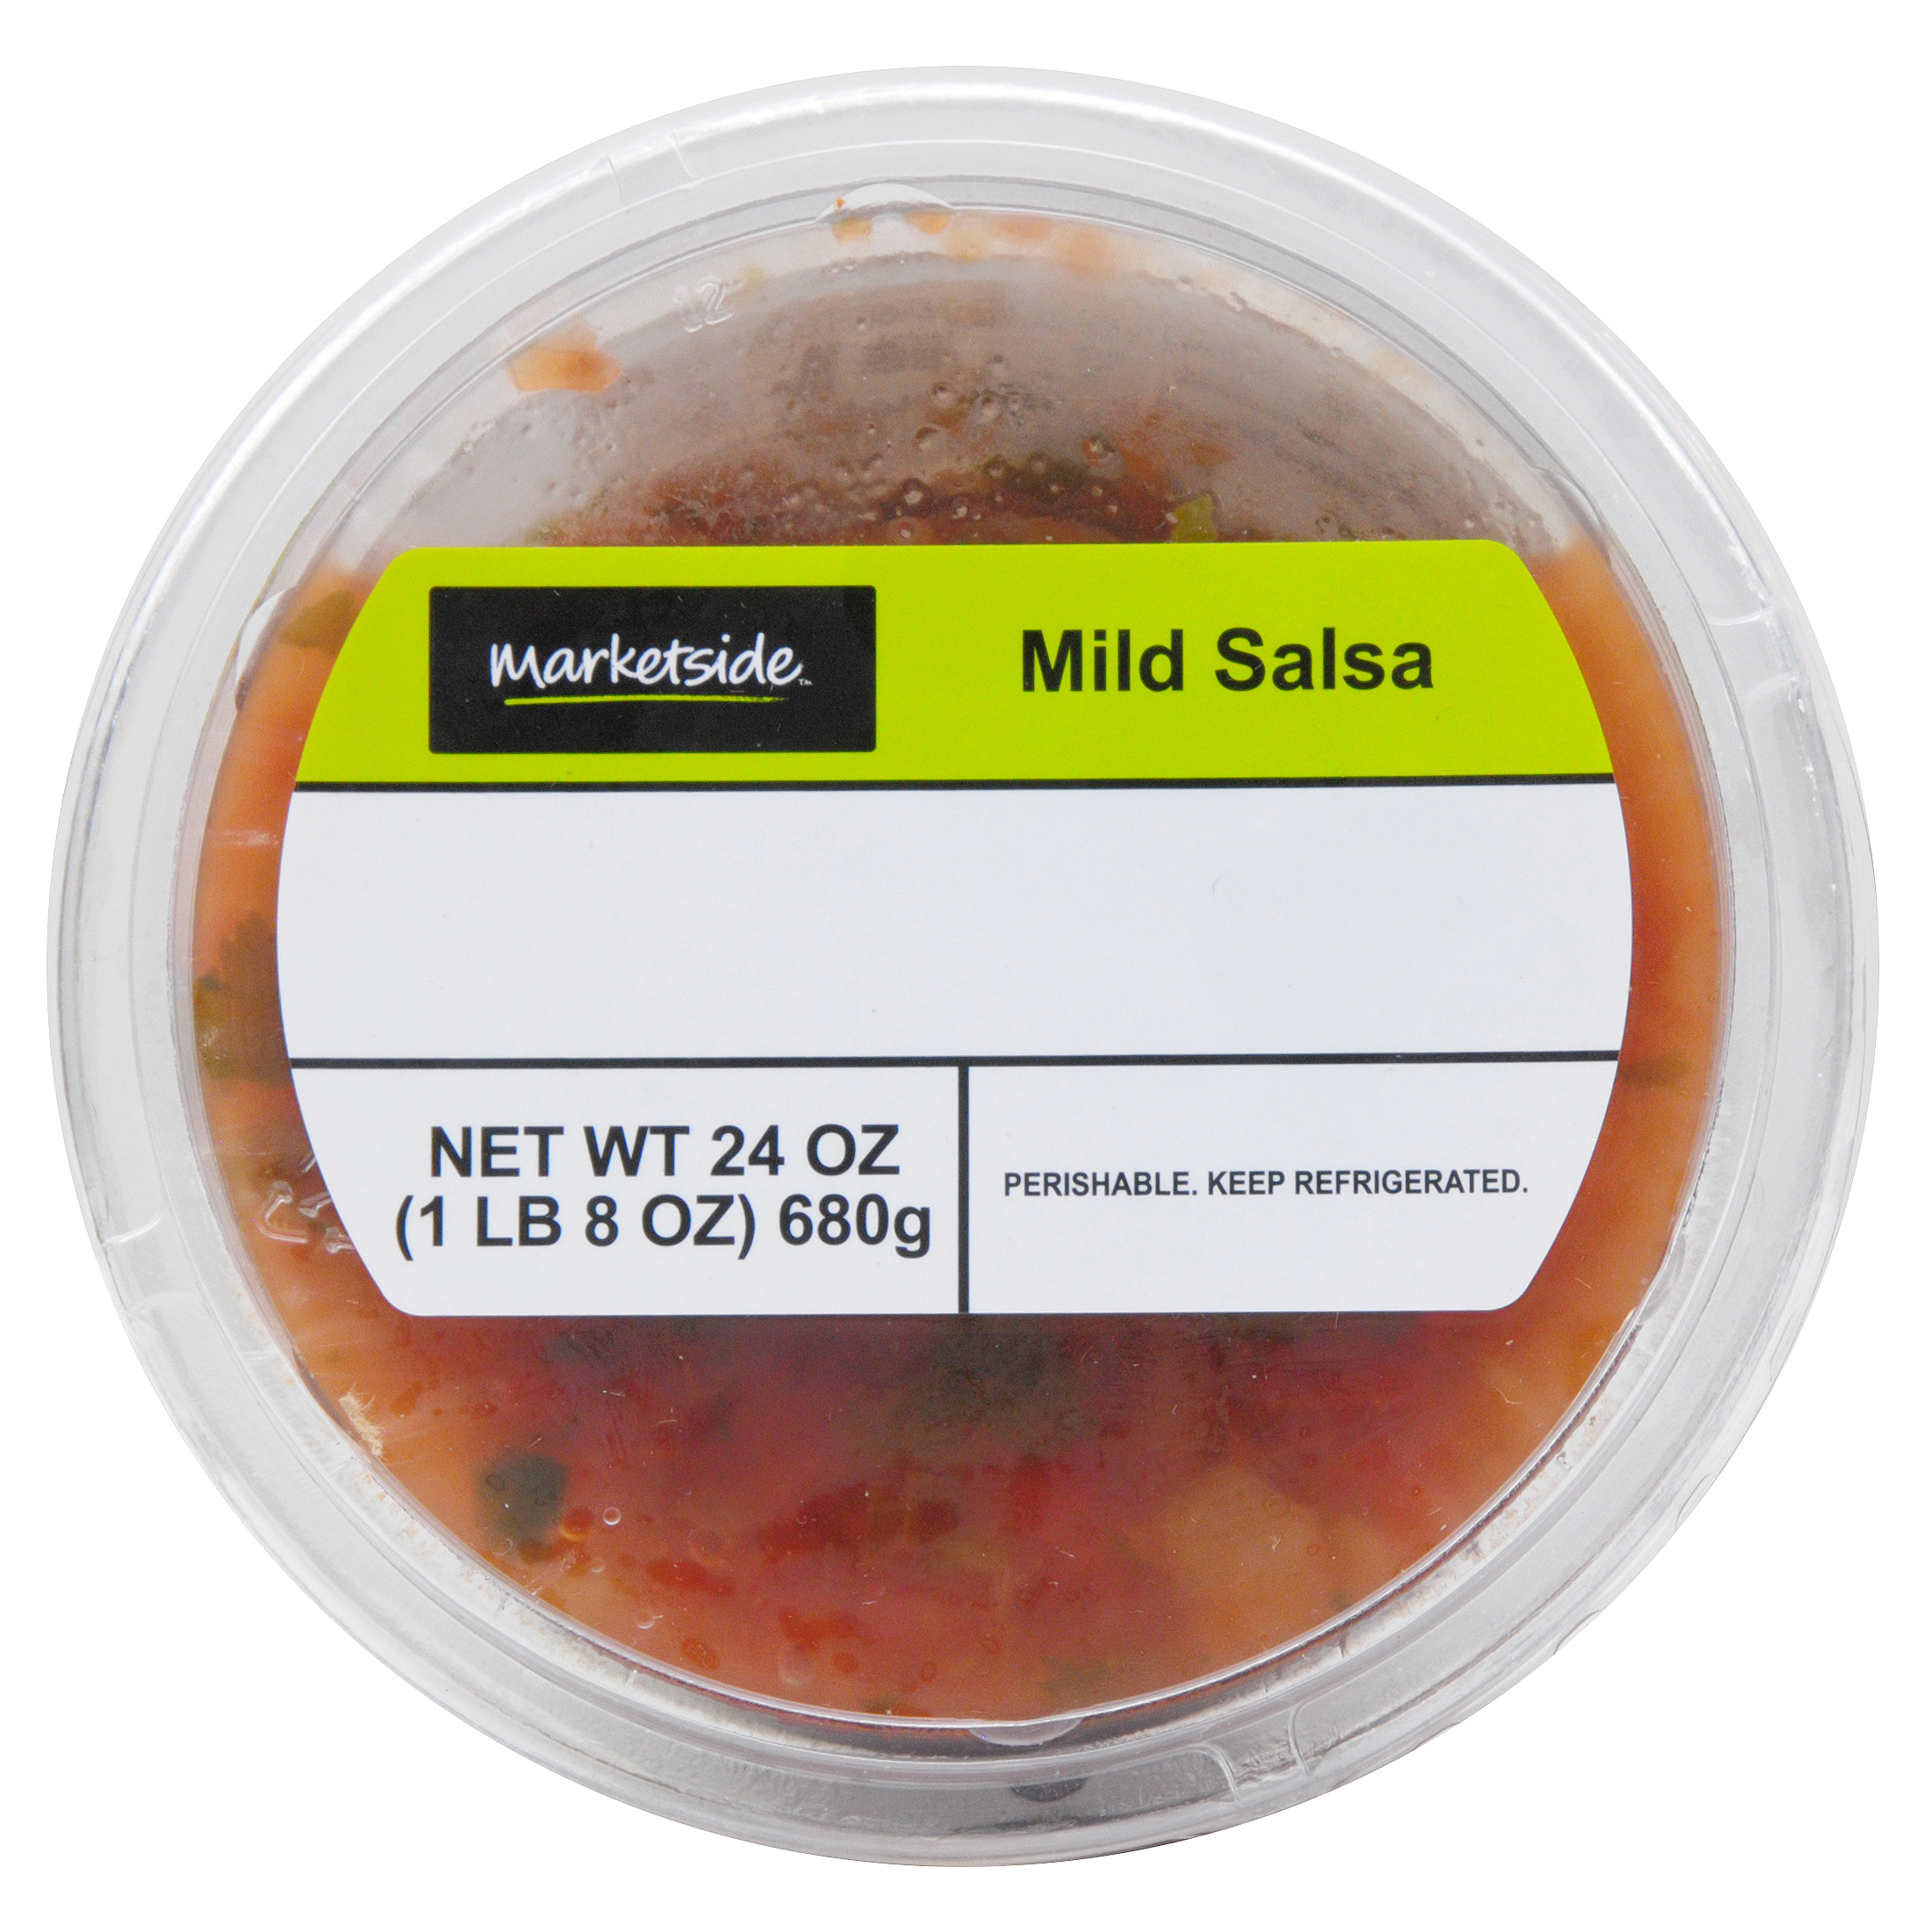 Marketside Mild Salsa, 24 oz